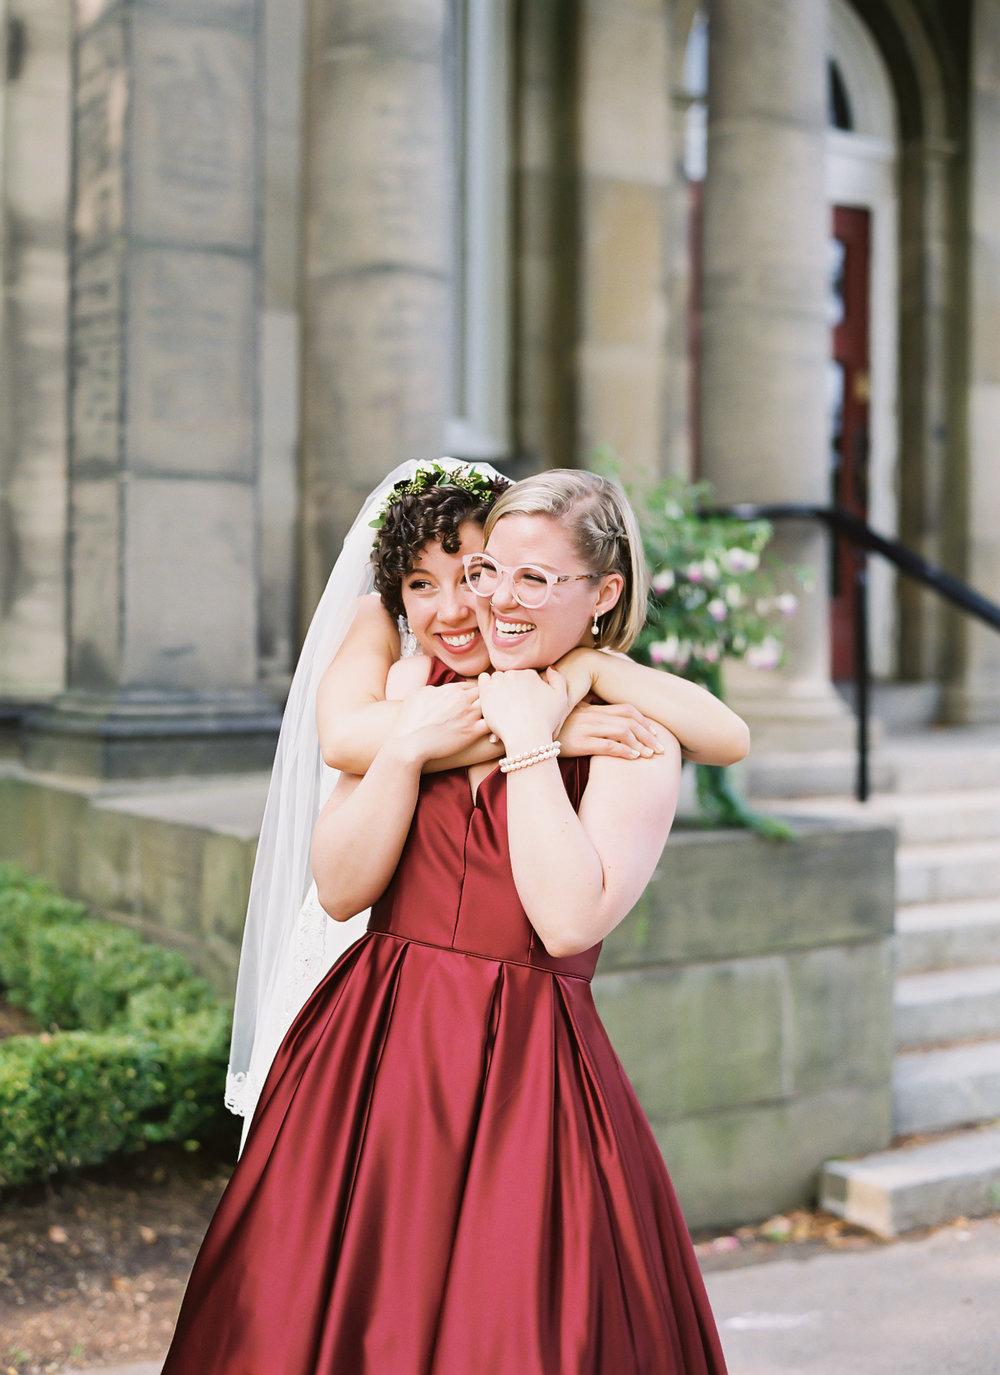 Jacqueline Anne Photography, Halifax Wedding Photographer, Nova Scotia Wedding Photographer, Wedding Photographer based in Halifax, Wedding Photographers in Nova Scotia